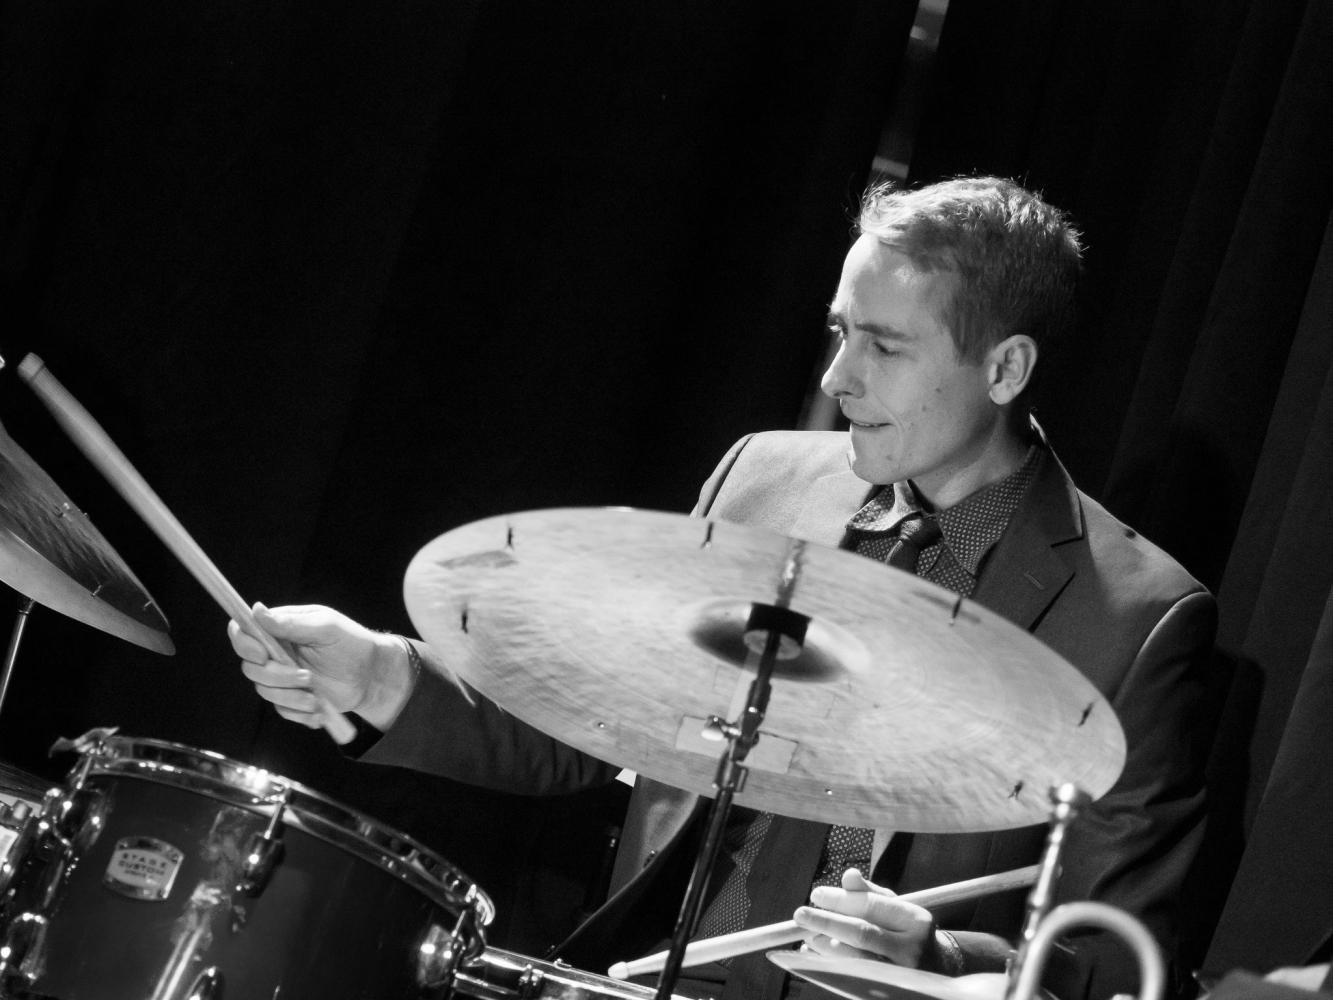 Joe Poole, drums